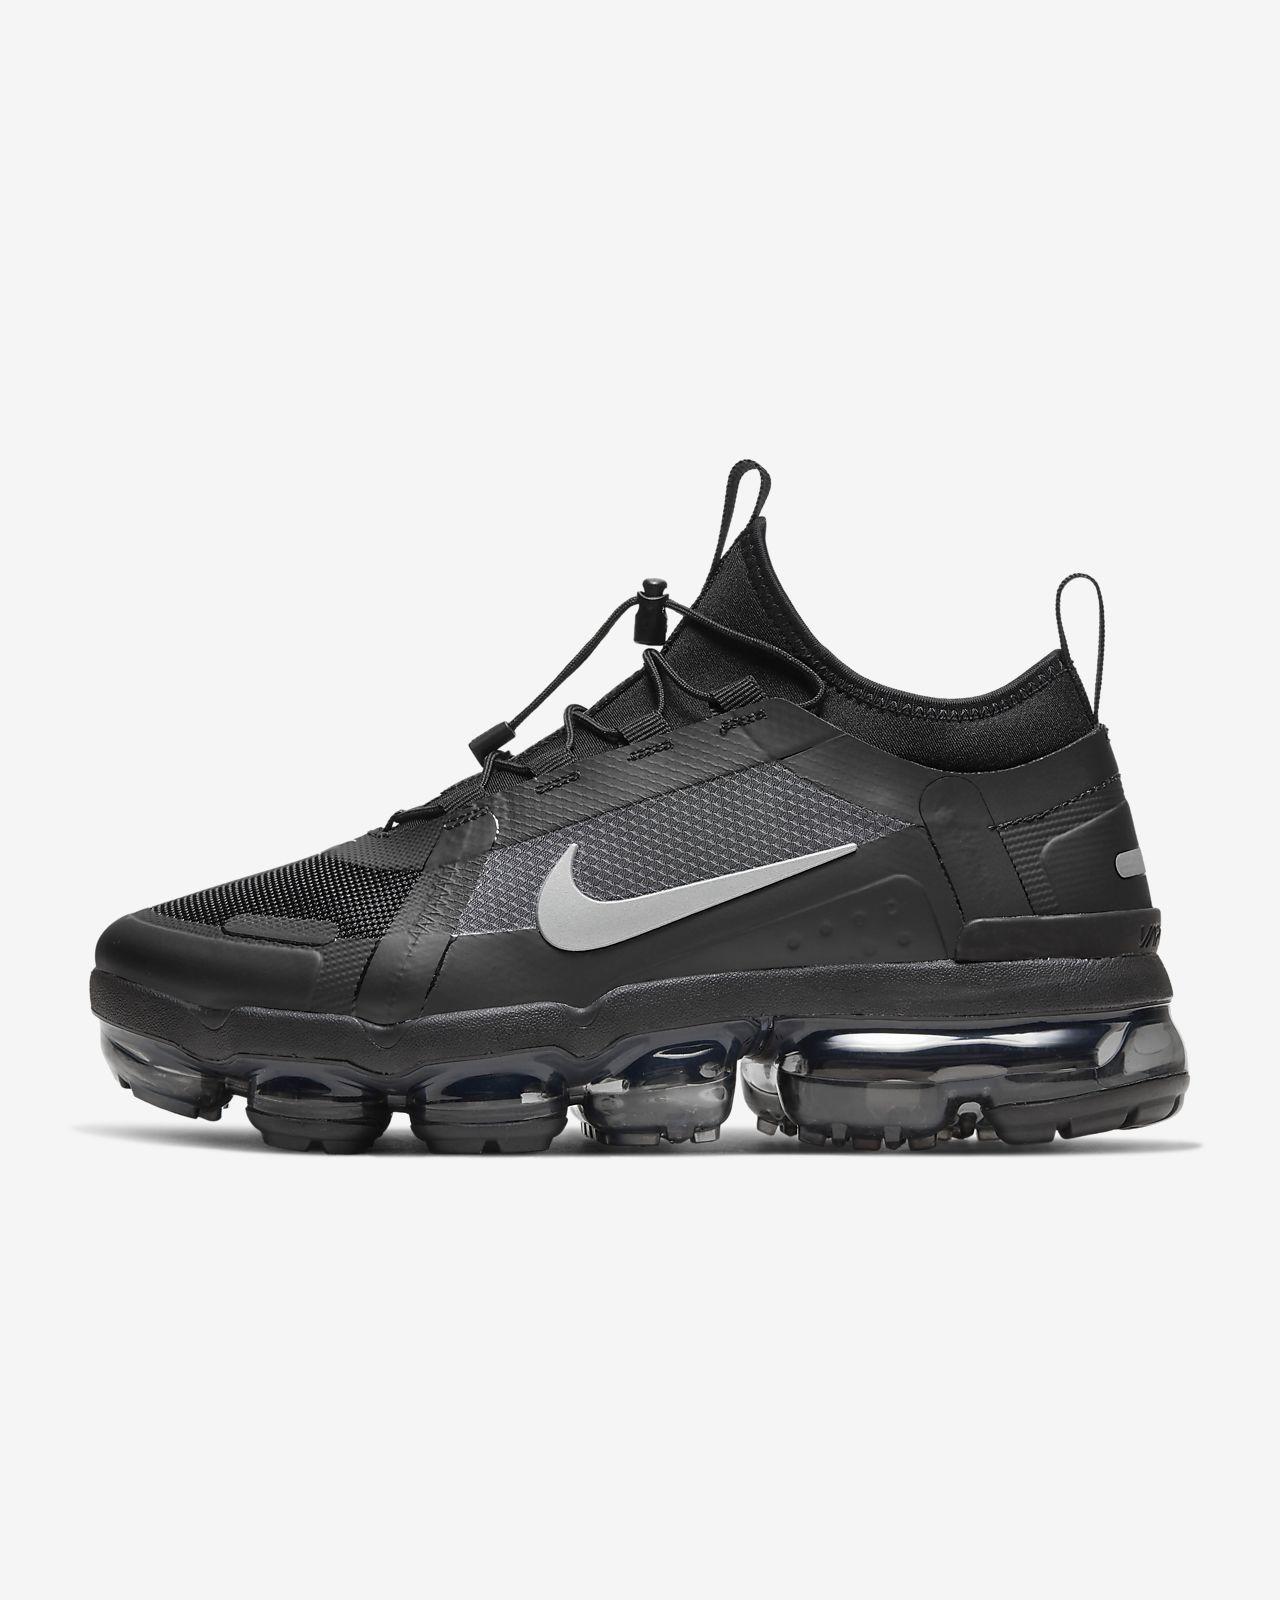 Chaussure Nike Air VaporMax 2019 Utility pour Femme